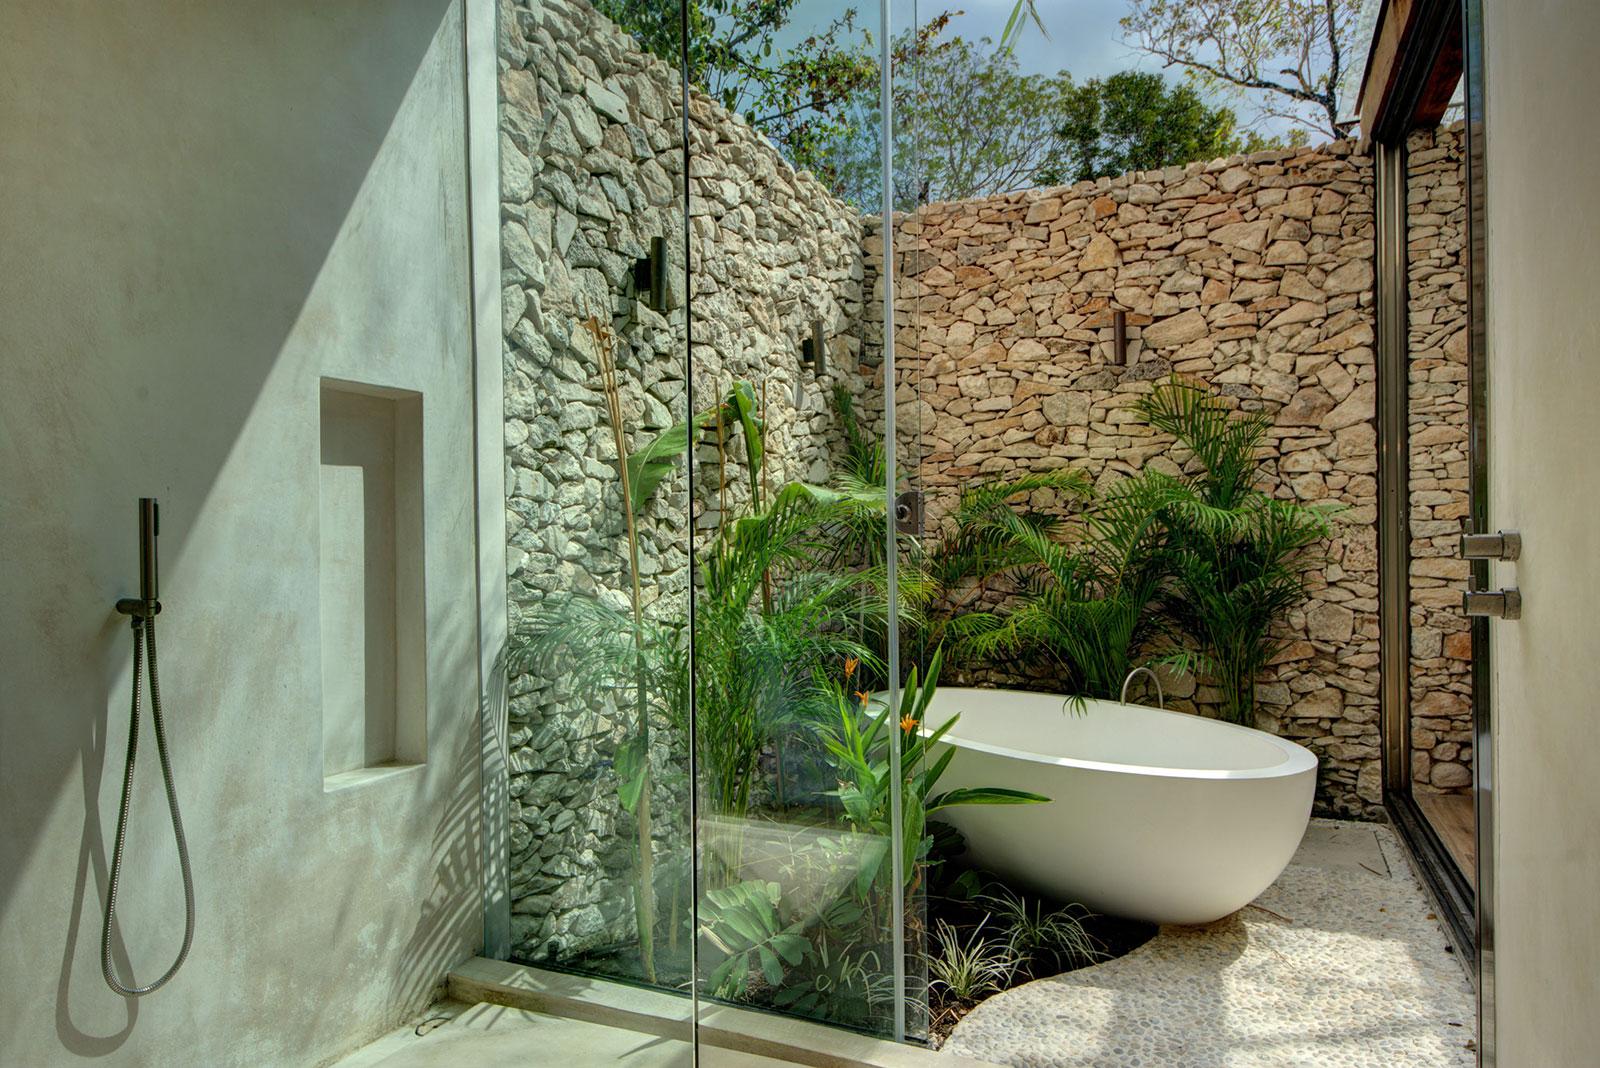 Maya_Luxe_Riviera_Maya_Luxury_Vacation_Rentals_What_to_do_Yucatan_Green_Gold_of_Yucatán_Hacienda_Adventure_35.jpg